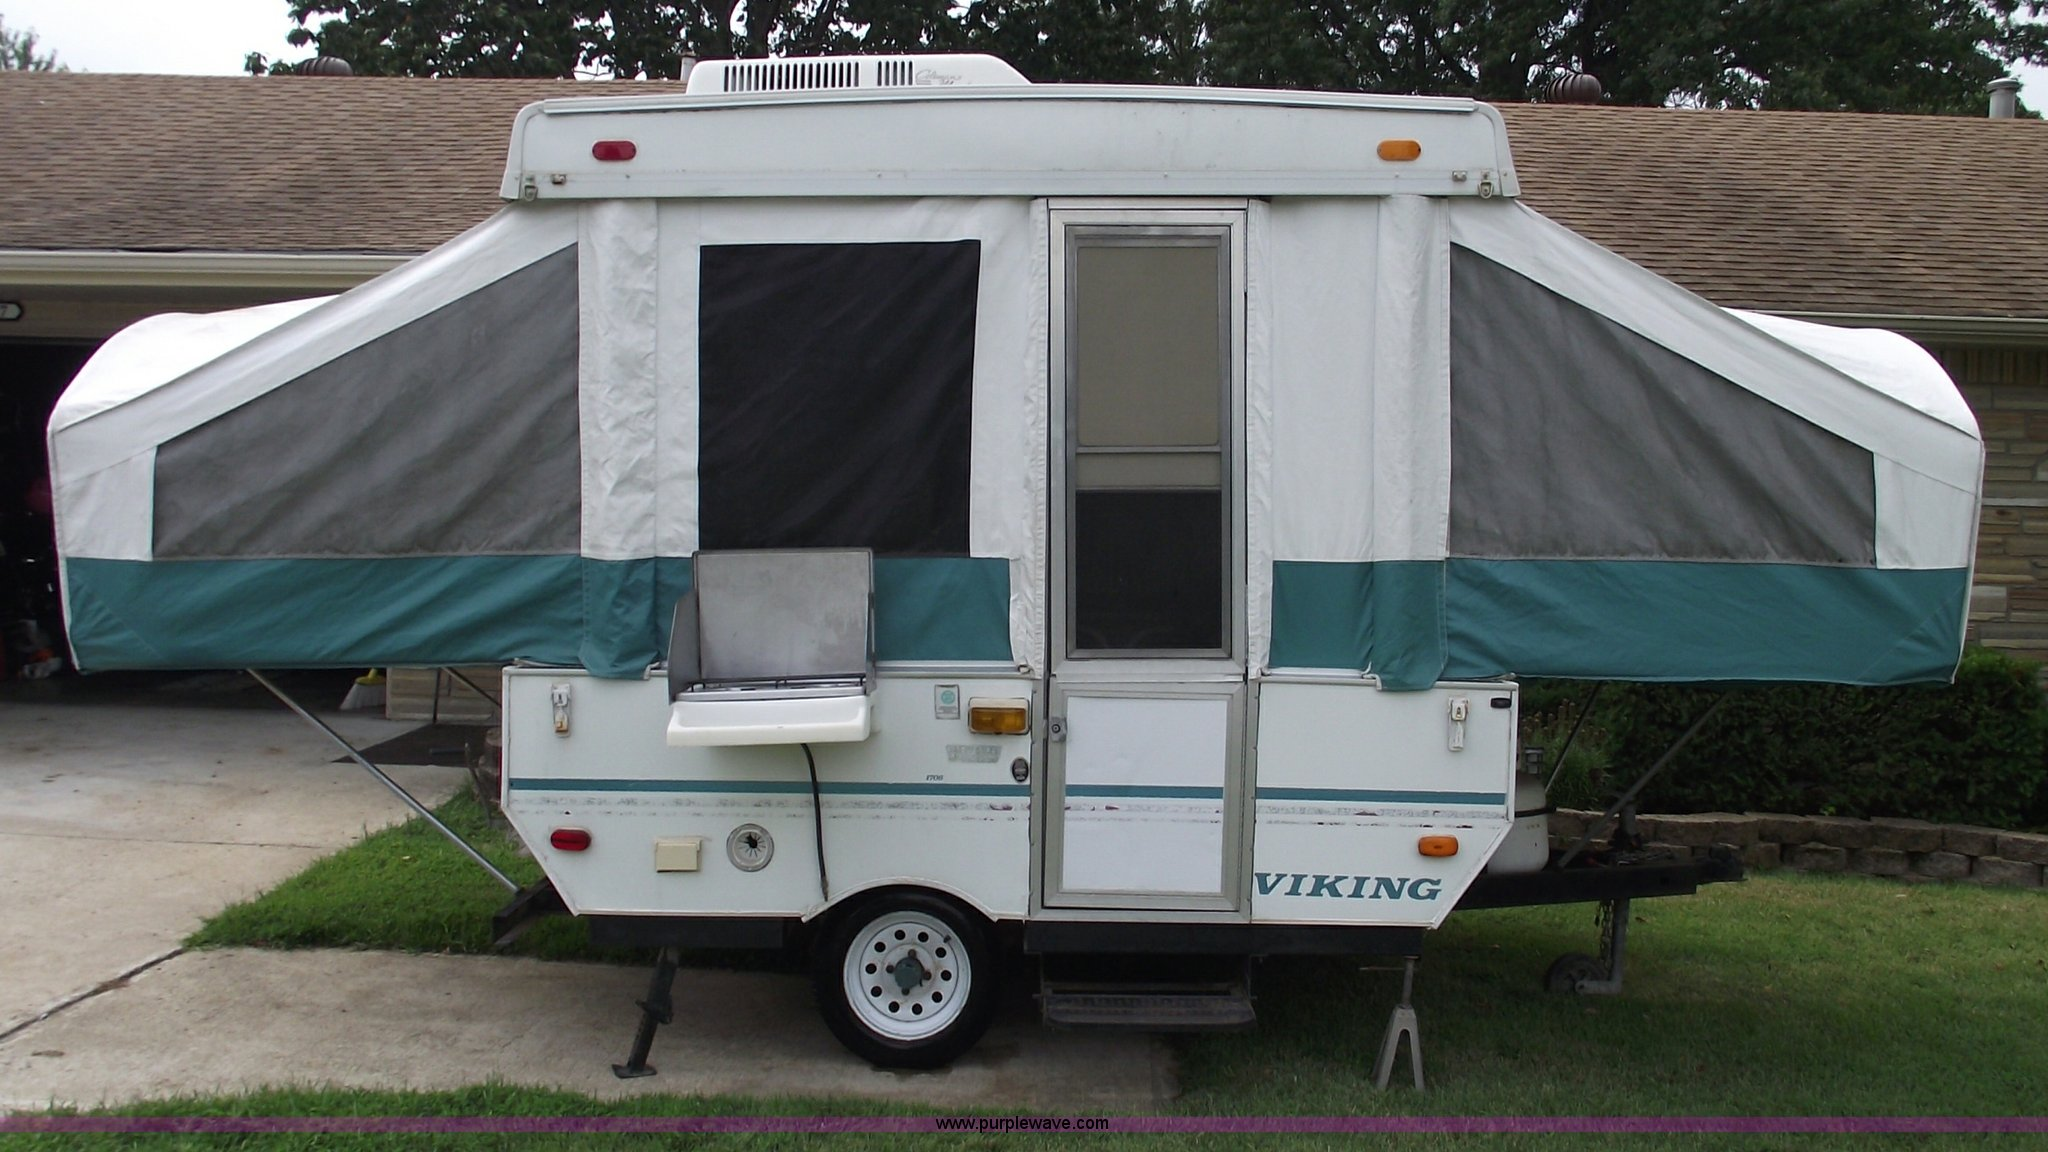 1996 Viking 1706 pop-up camper | Item A4062 | SOLD ...